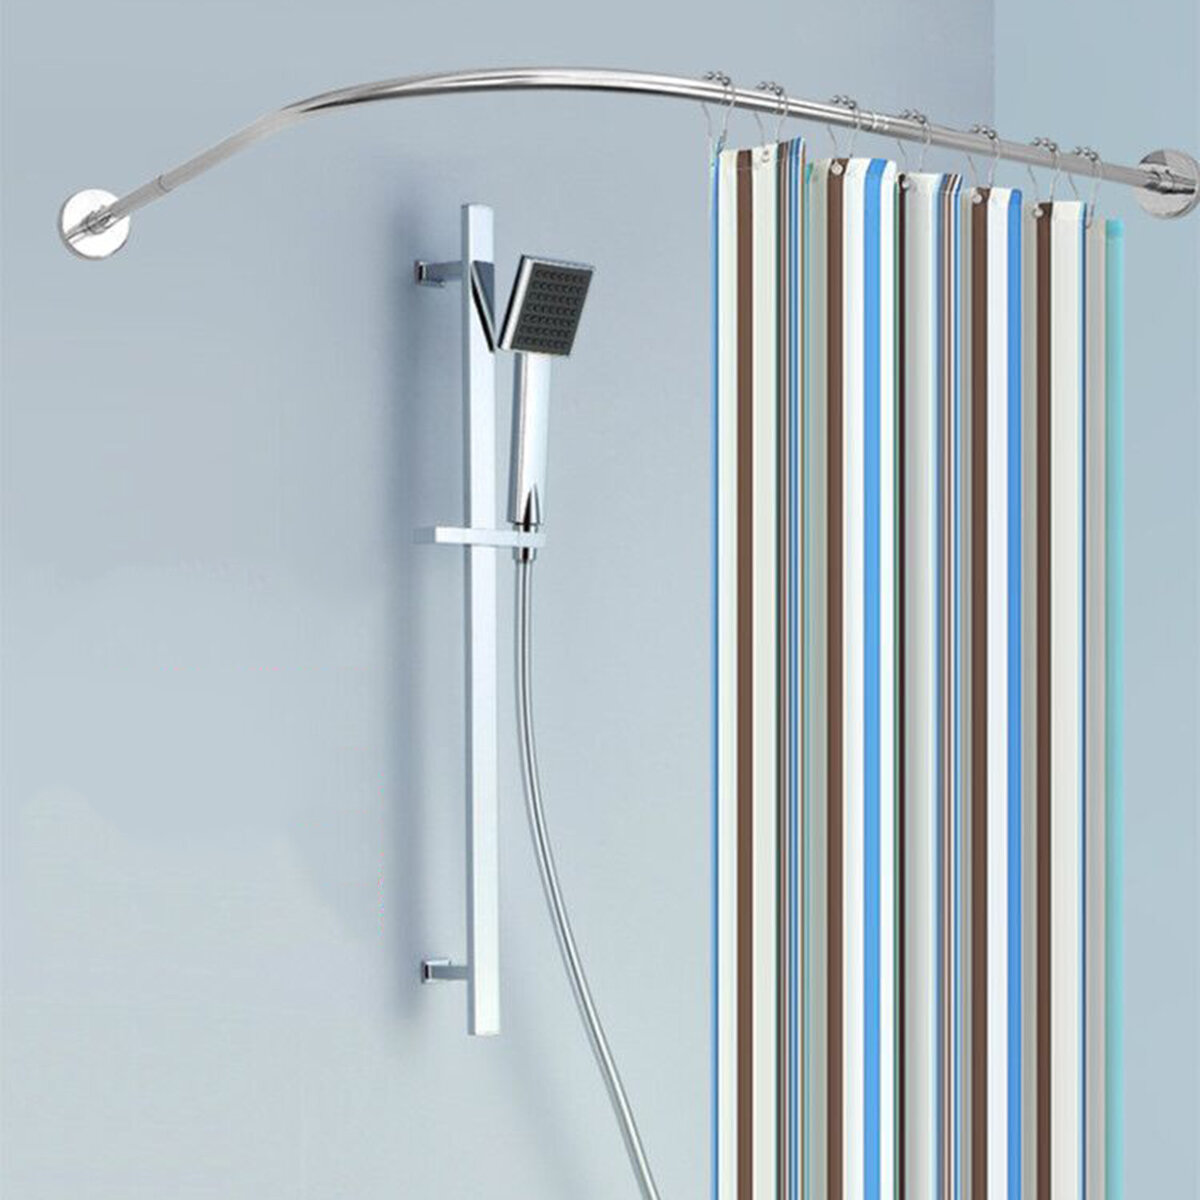 Stainless Steel Adjustable Curved Shower Curtain Rod Bathroom Bars Rail Rod